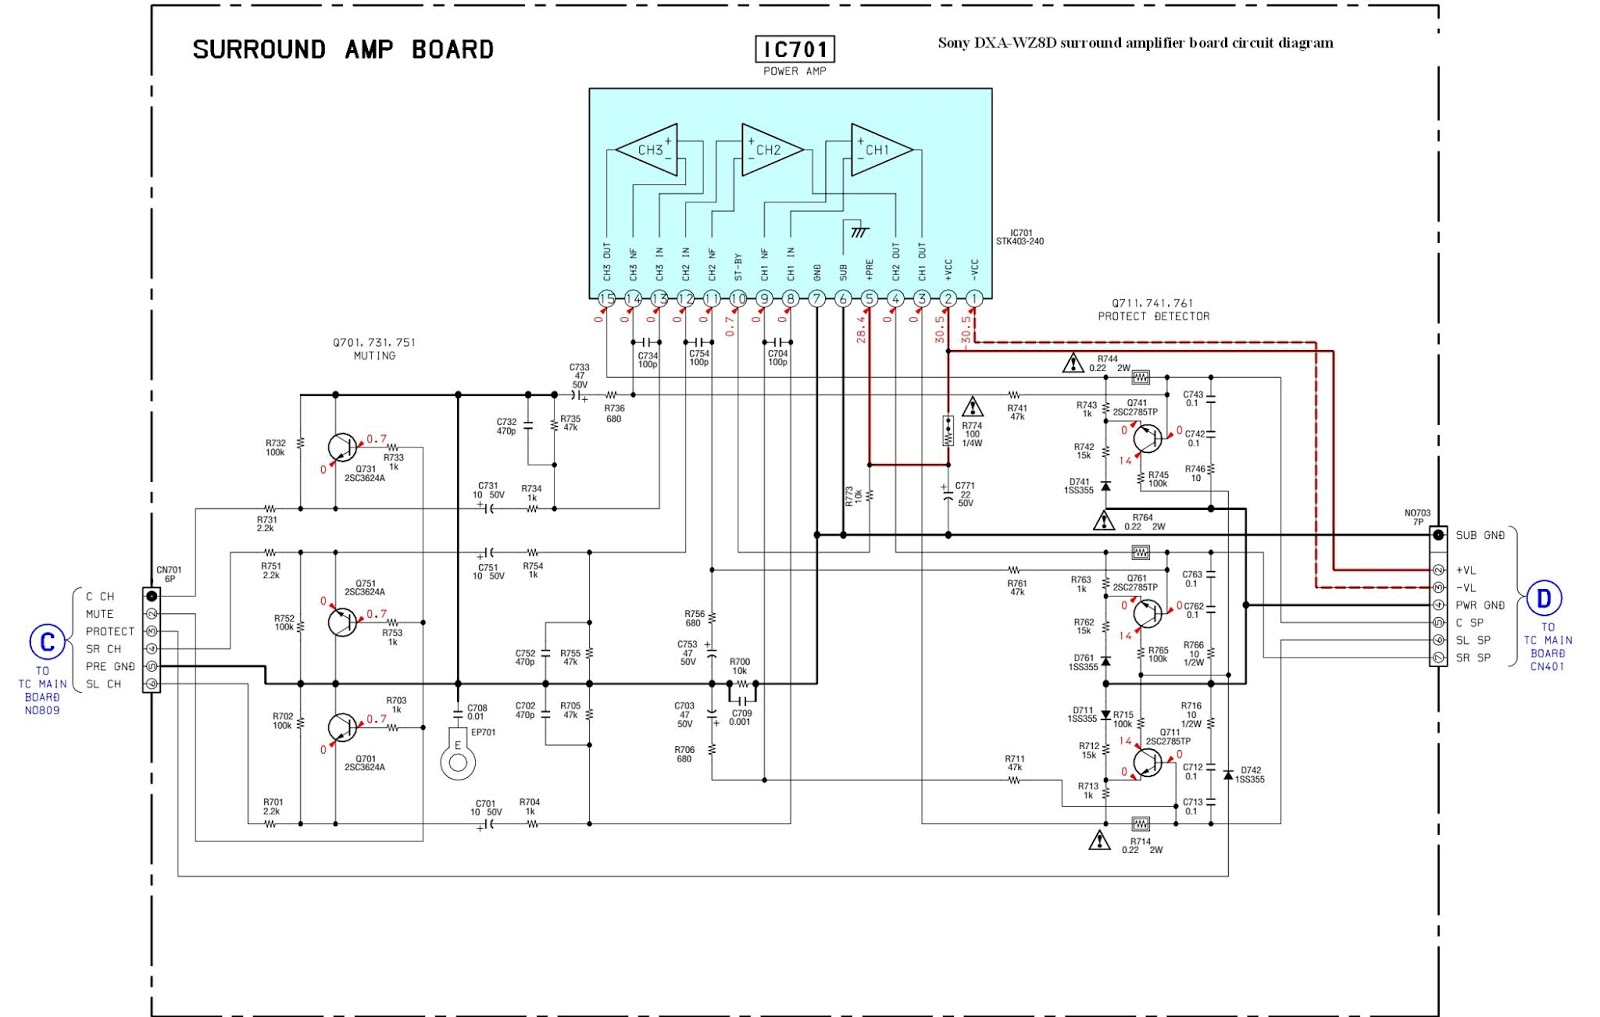 sony dxa wz8d surround amplifier board circuit diagram [ 1600 x 1017 Pixel ]